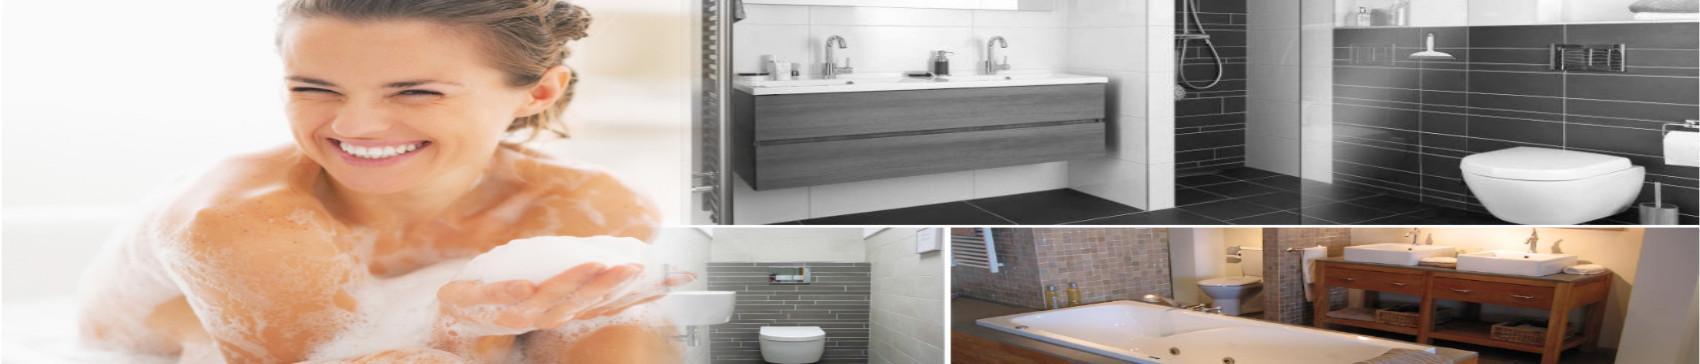 Sanitair-winkels.nl | Een ruim assortiment Dessing sanitair bij ...